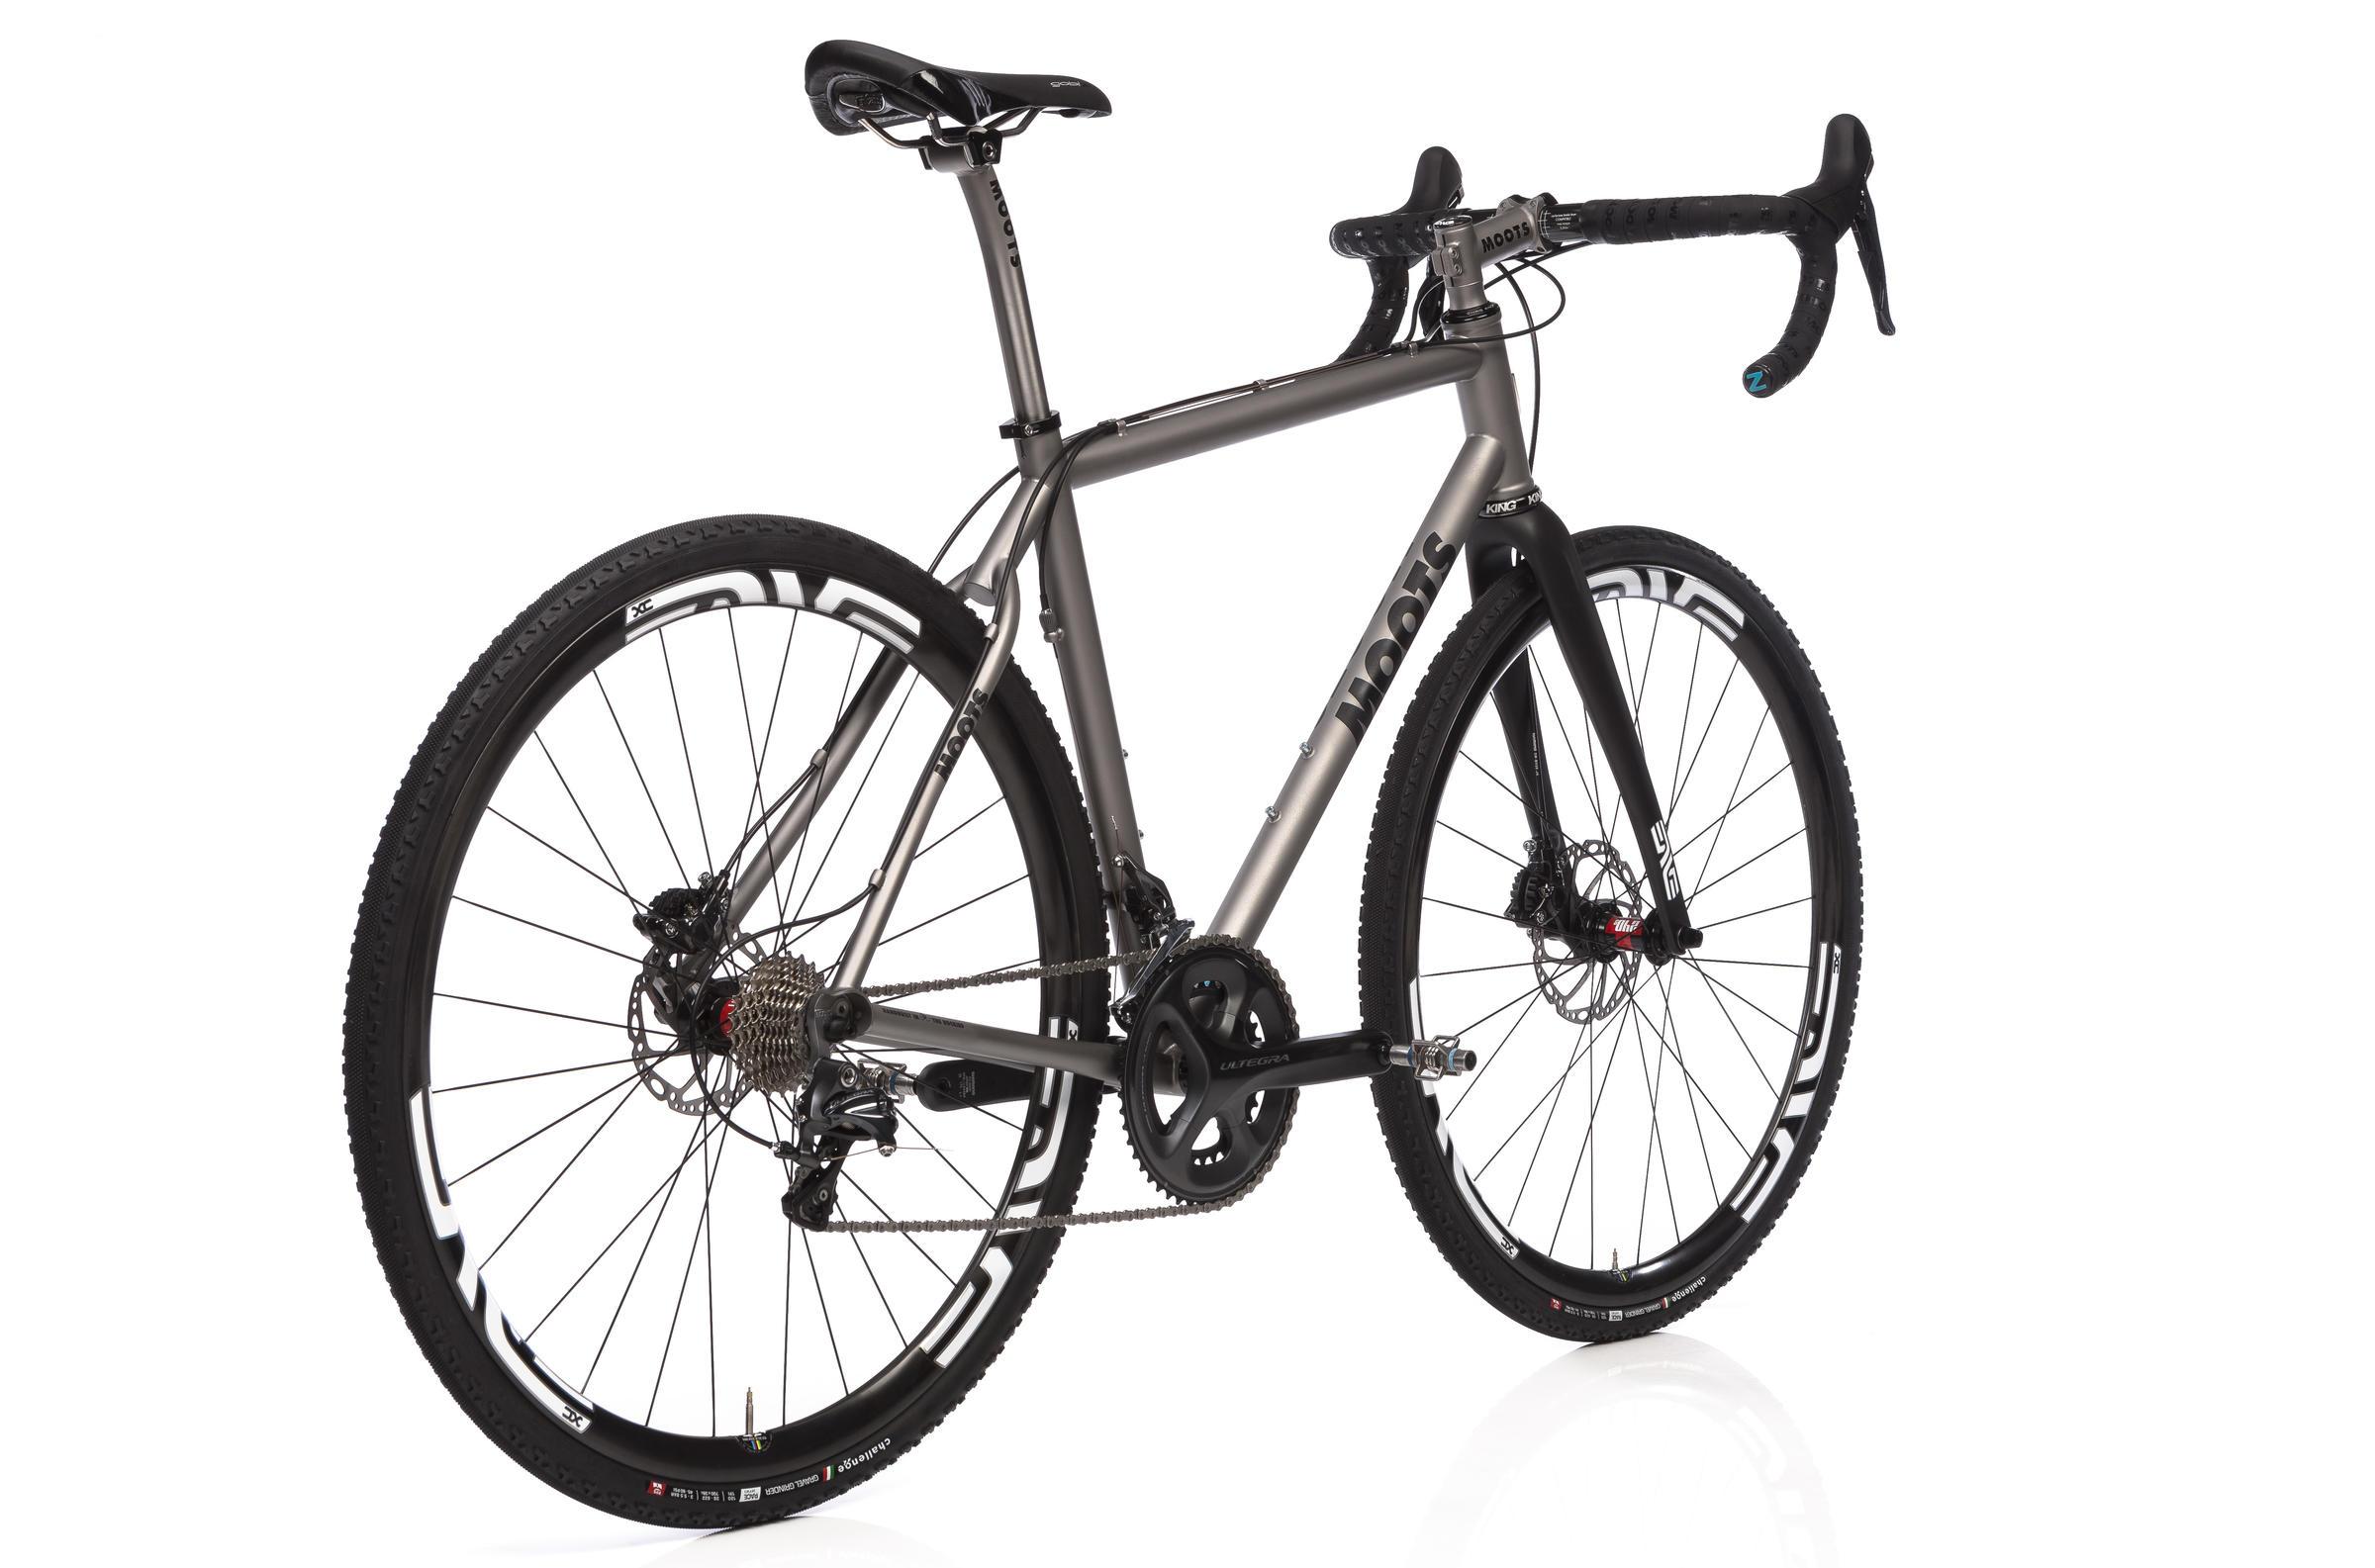 Moots Routt 45 DEMO BIKE - Calistoga Bikeshop